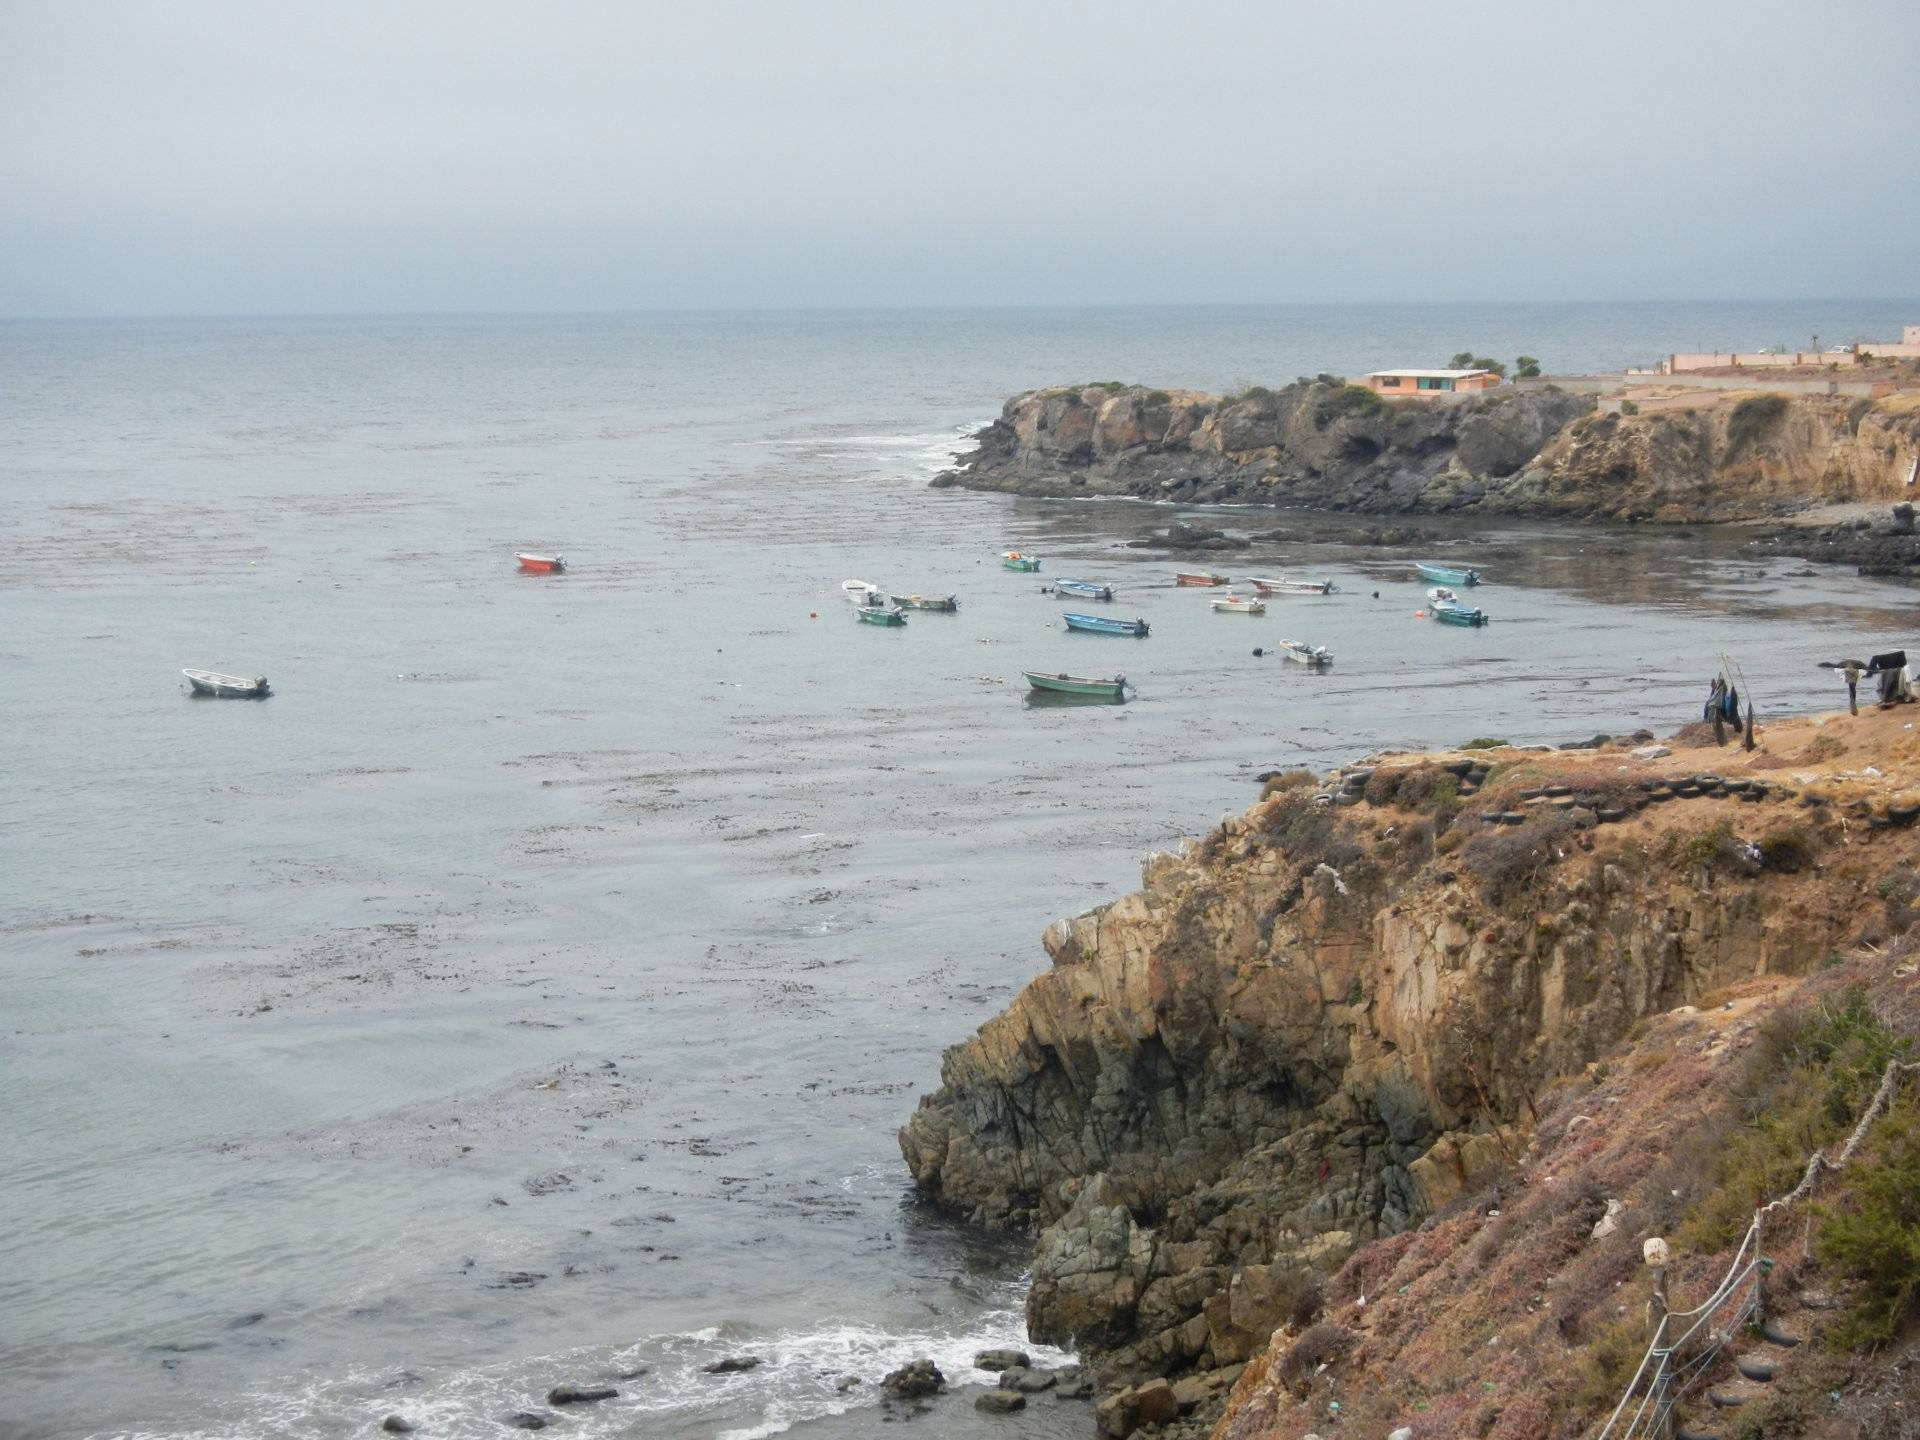 La jolla bait invasion saltwater fishing forums for La jolla fishing